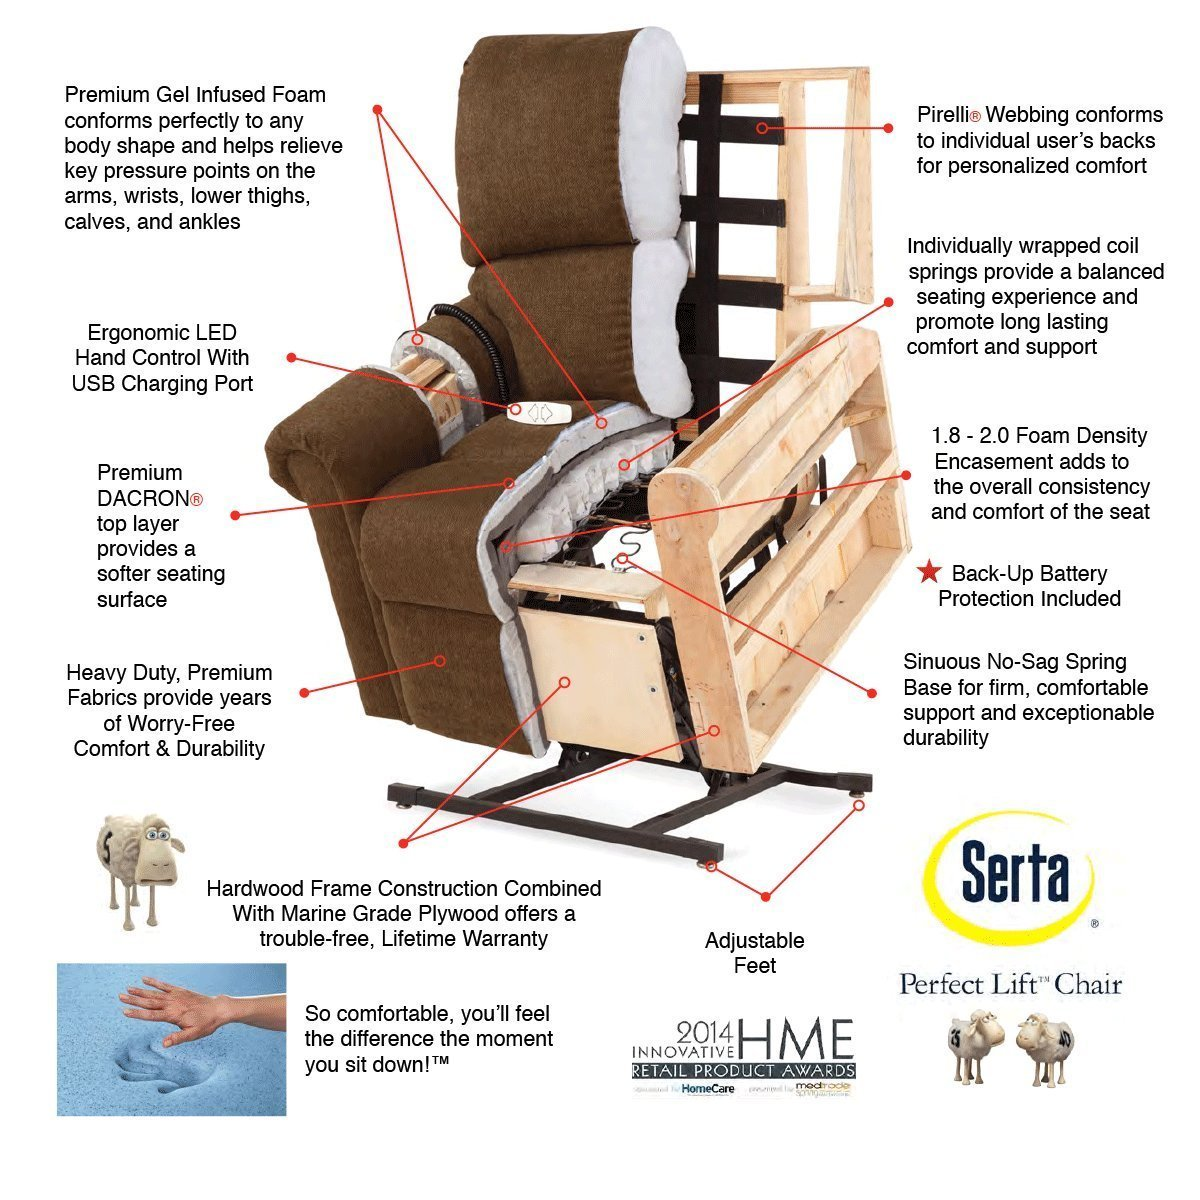 foam massage tall p memory big serta multiple colors dark of recliner chair brown picture